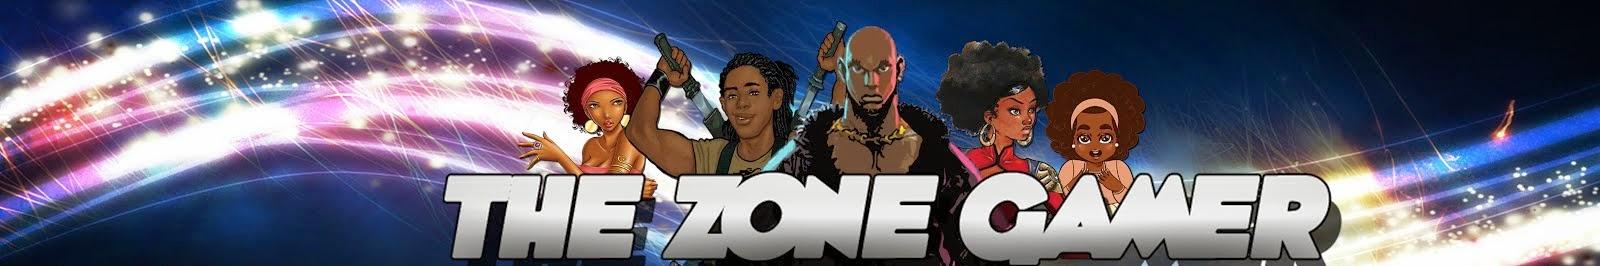 TheZonegamer